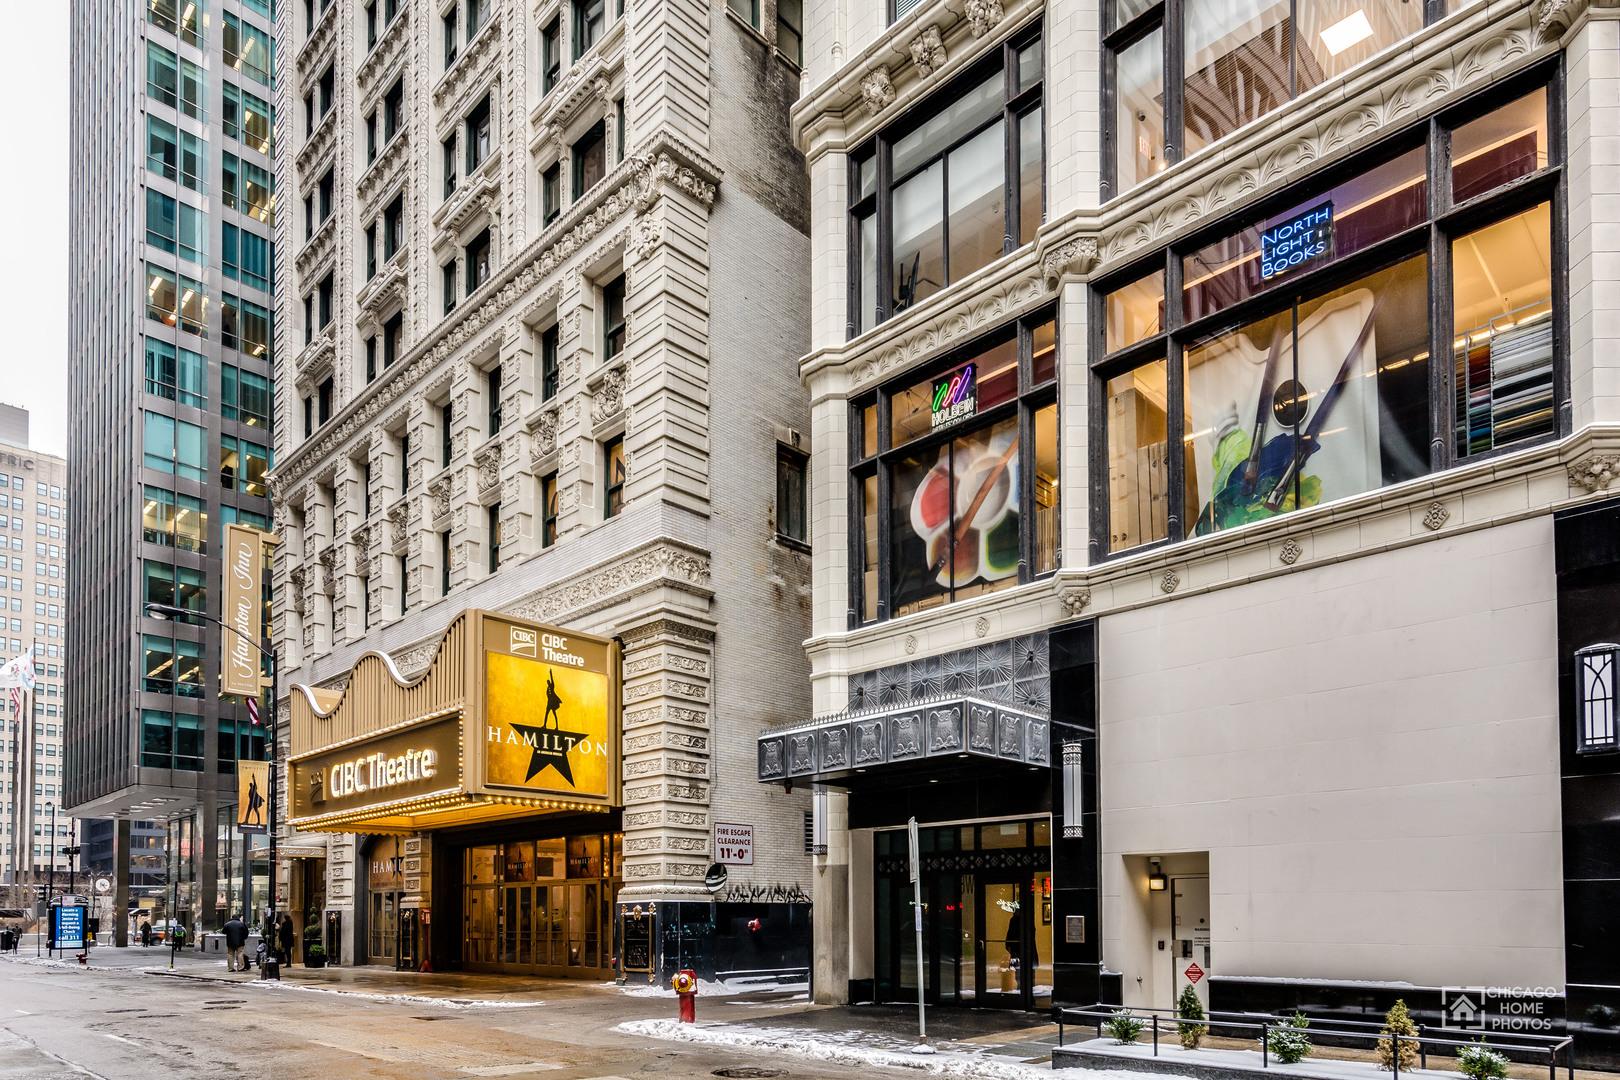 Chicago illinois fashion market Topic Galleries - Chicago Tribune